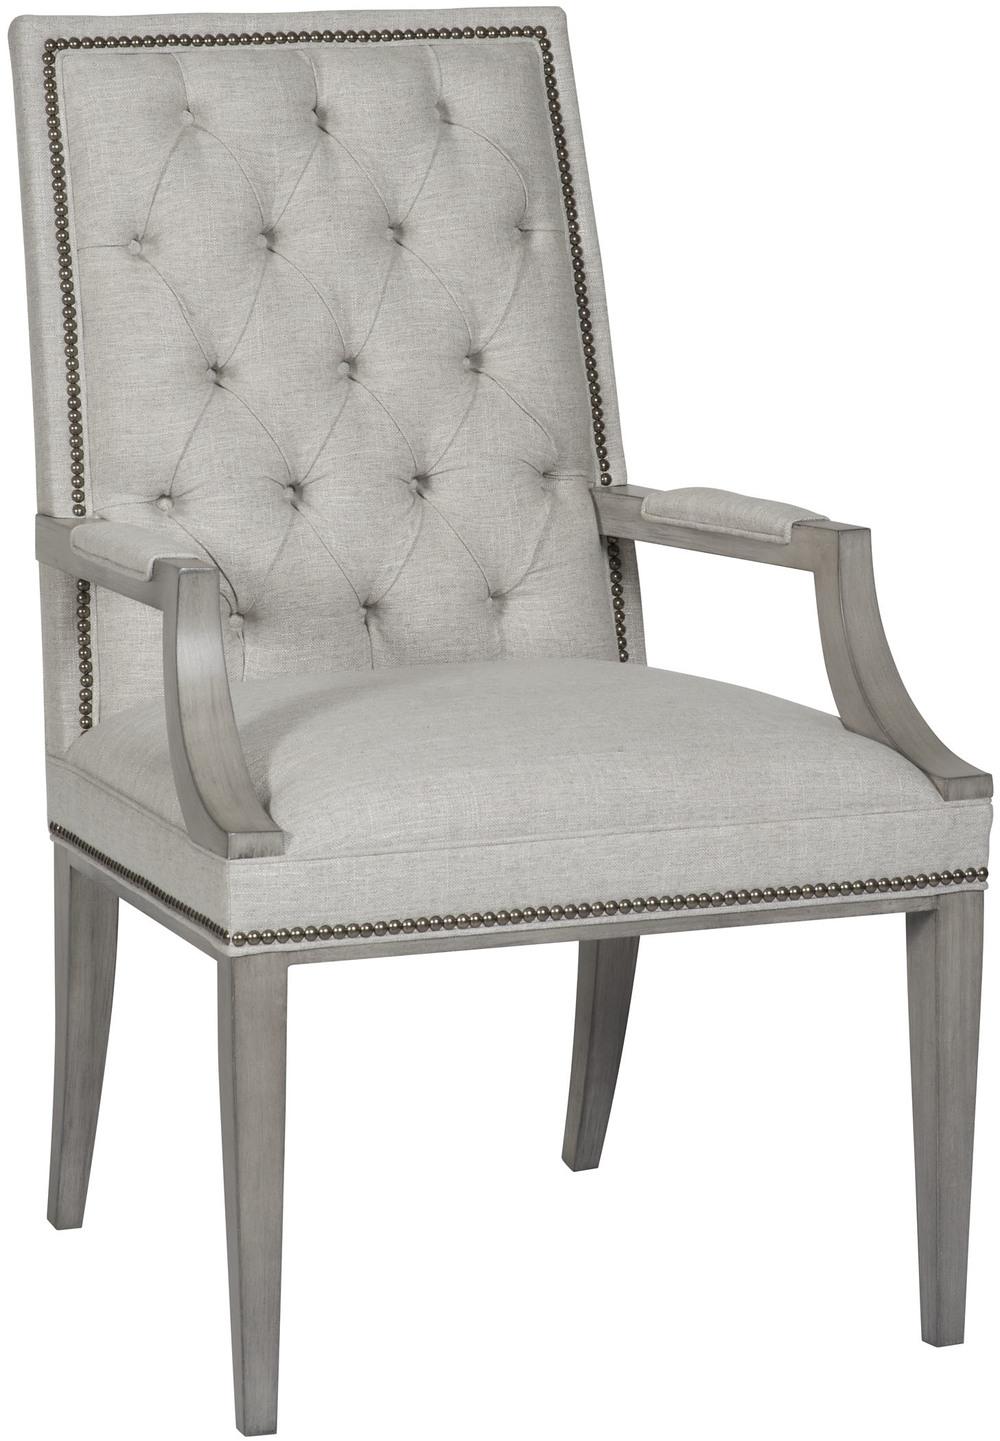 Vanguard Furniture - Hanover Button Back Arm Chair